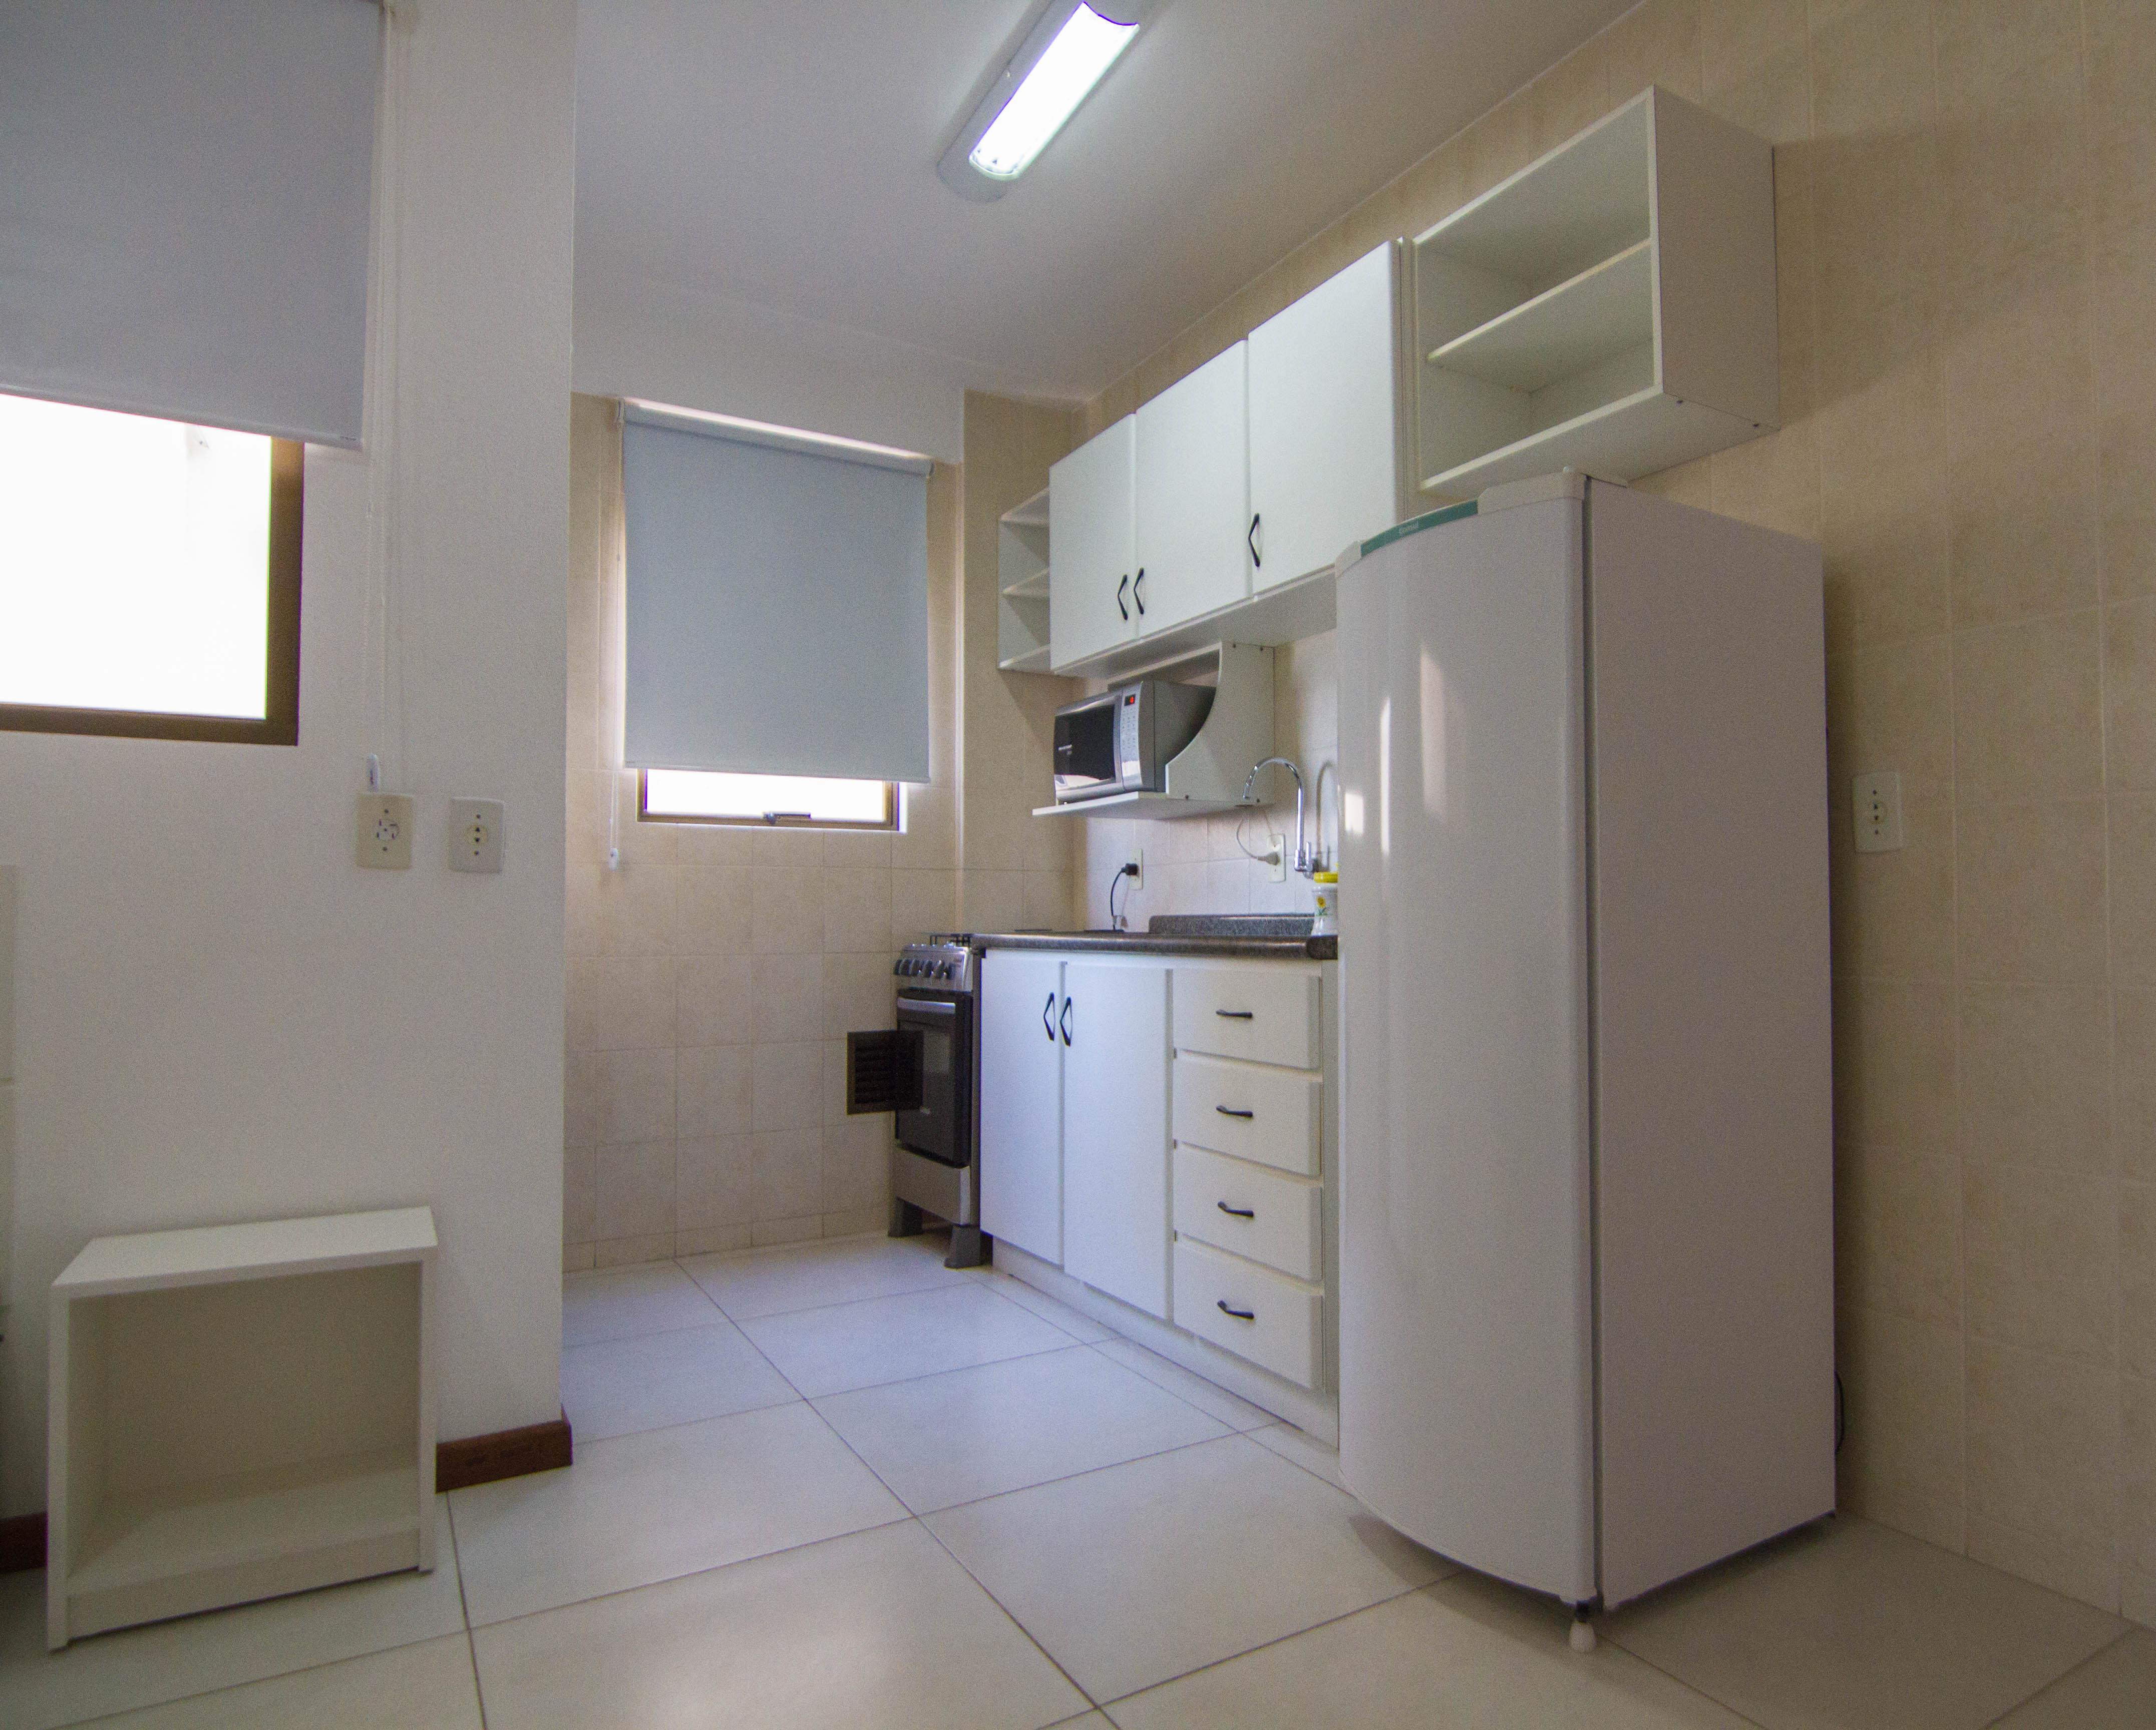 Flat 1 Quarto Superior Acomoda O Fragata Apart Hotel